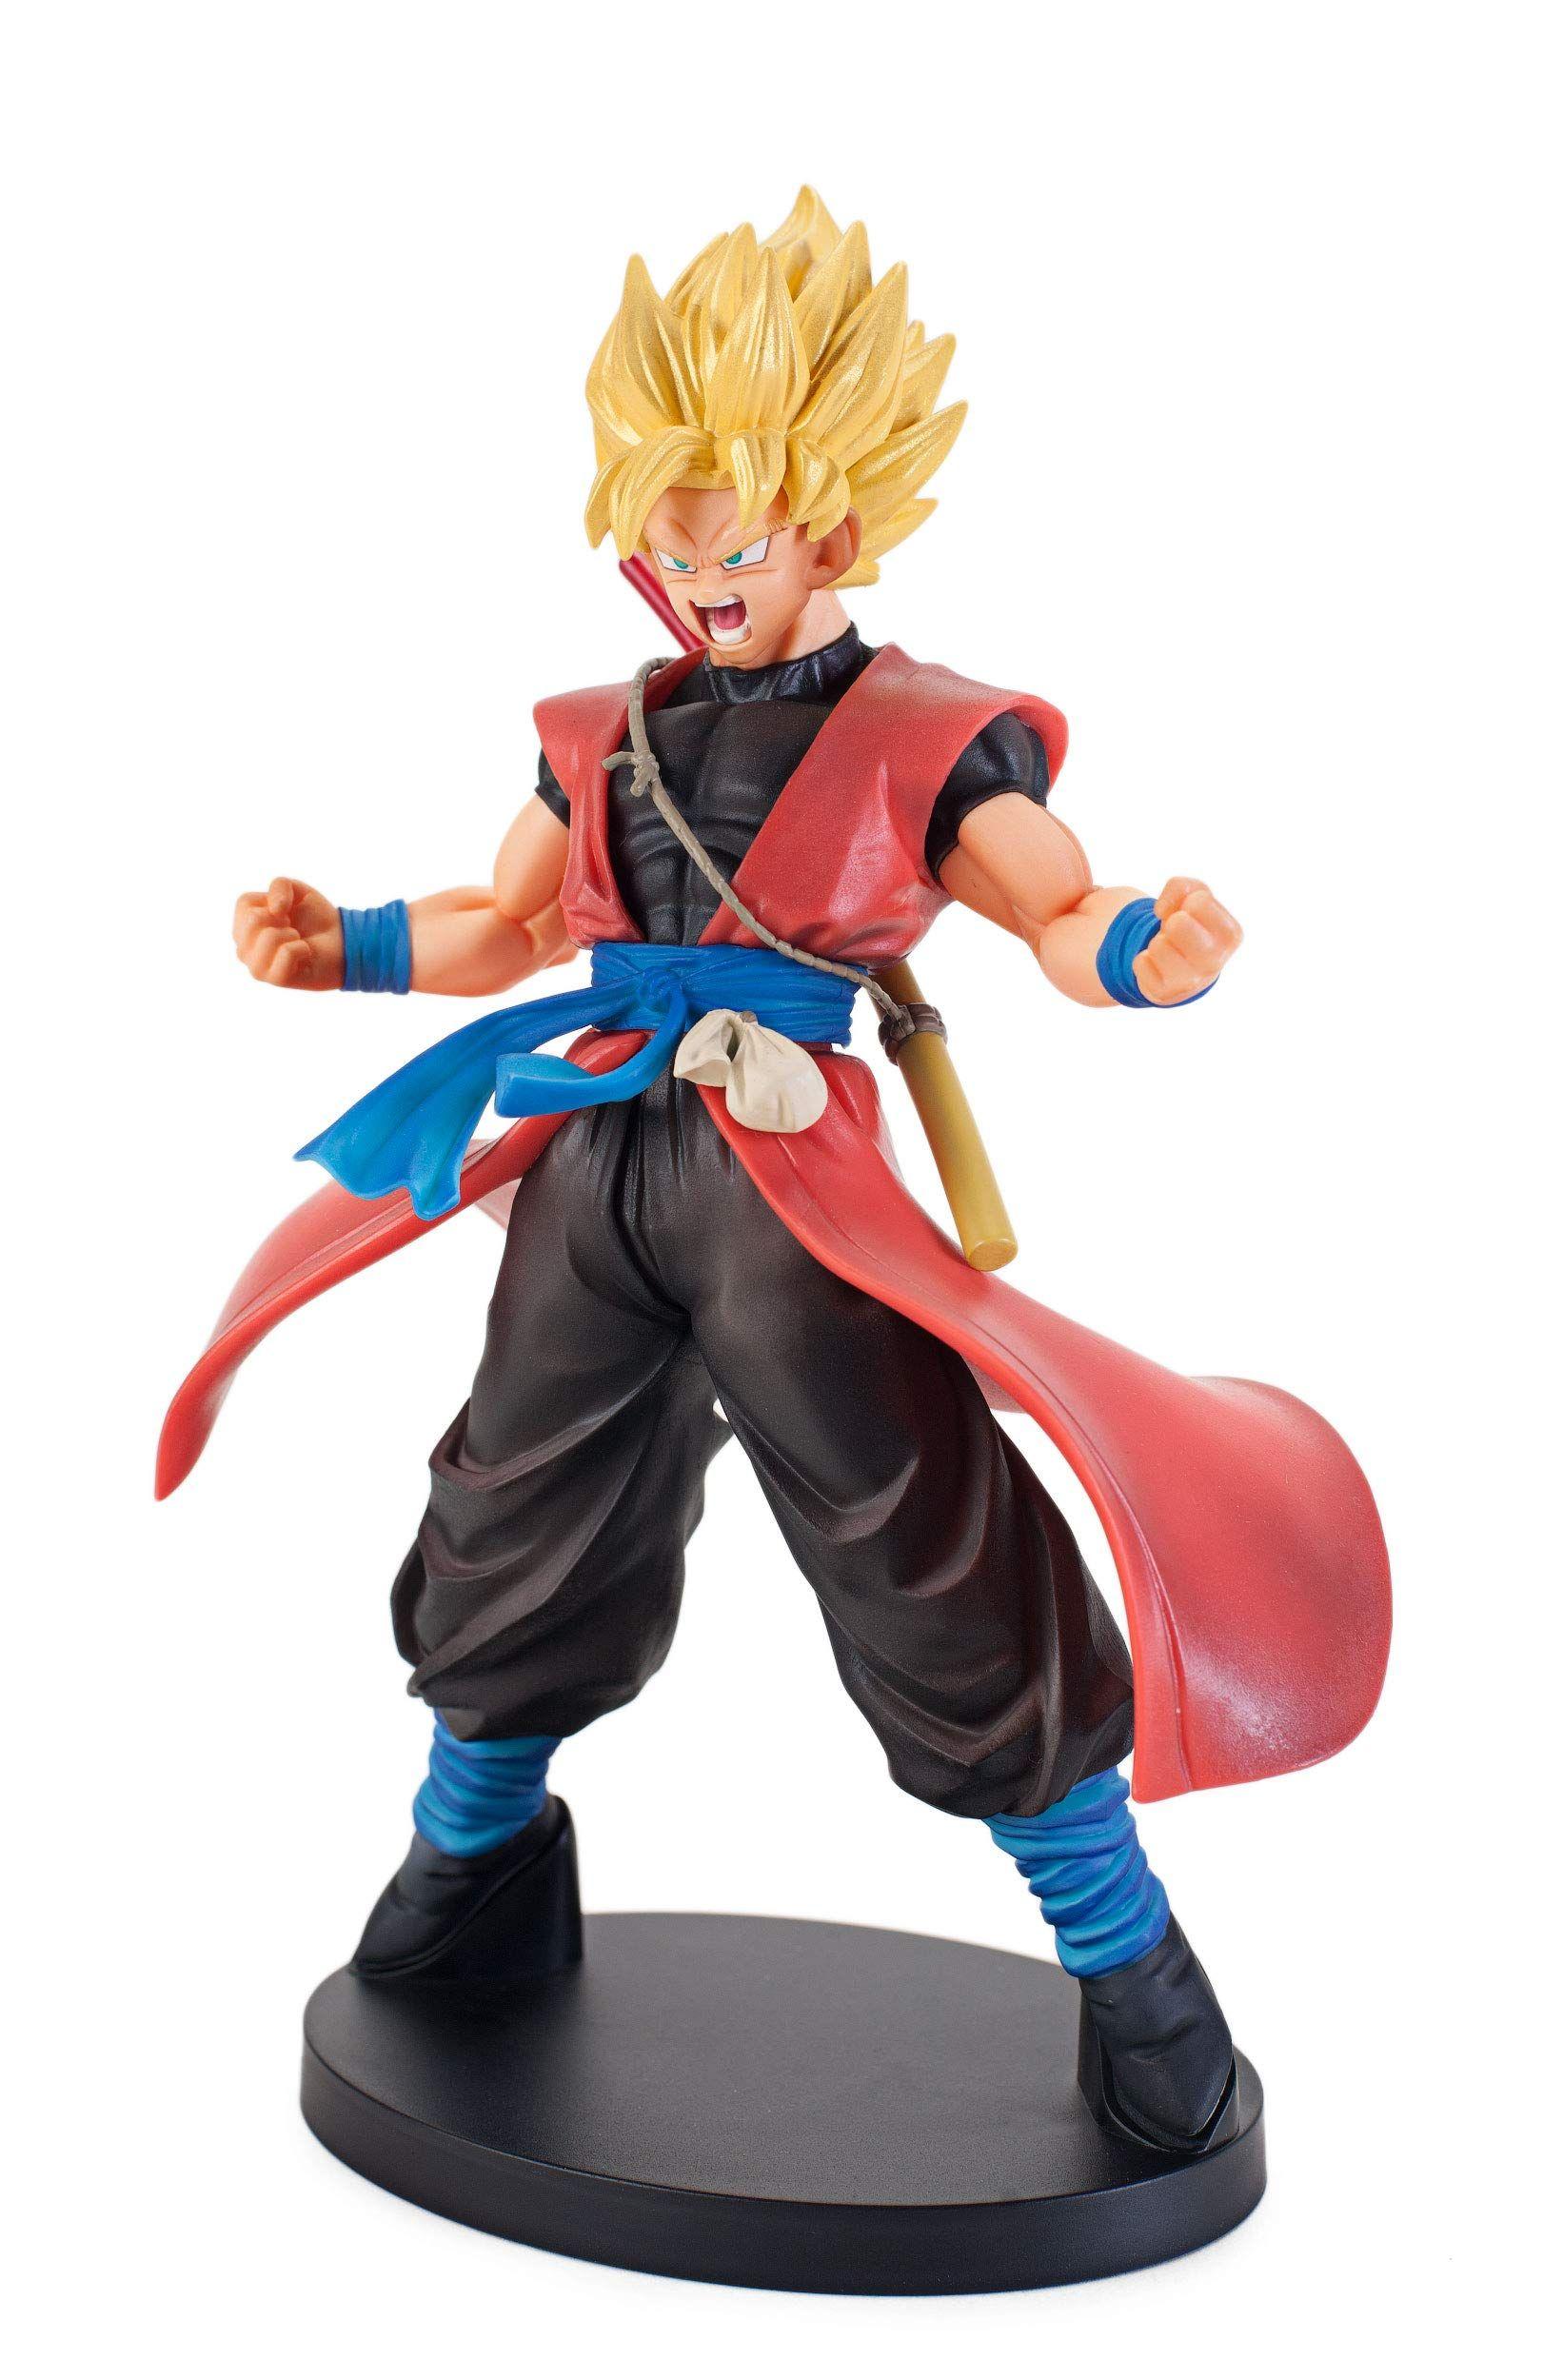 Super Dragonball Heroes DXF Vol.2 Super Saiyan Goku Xeno PVC figure Banpresto